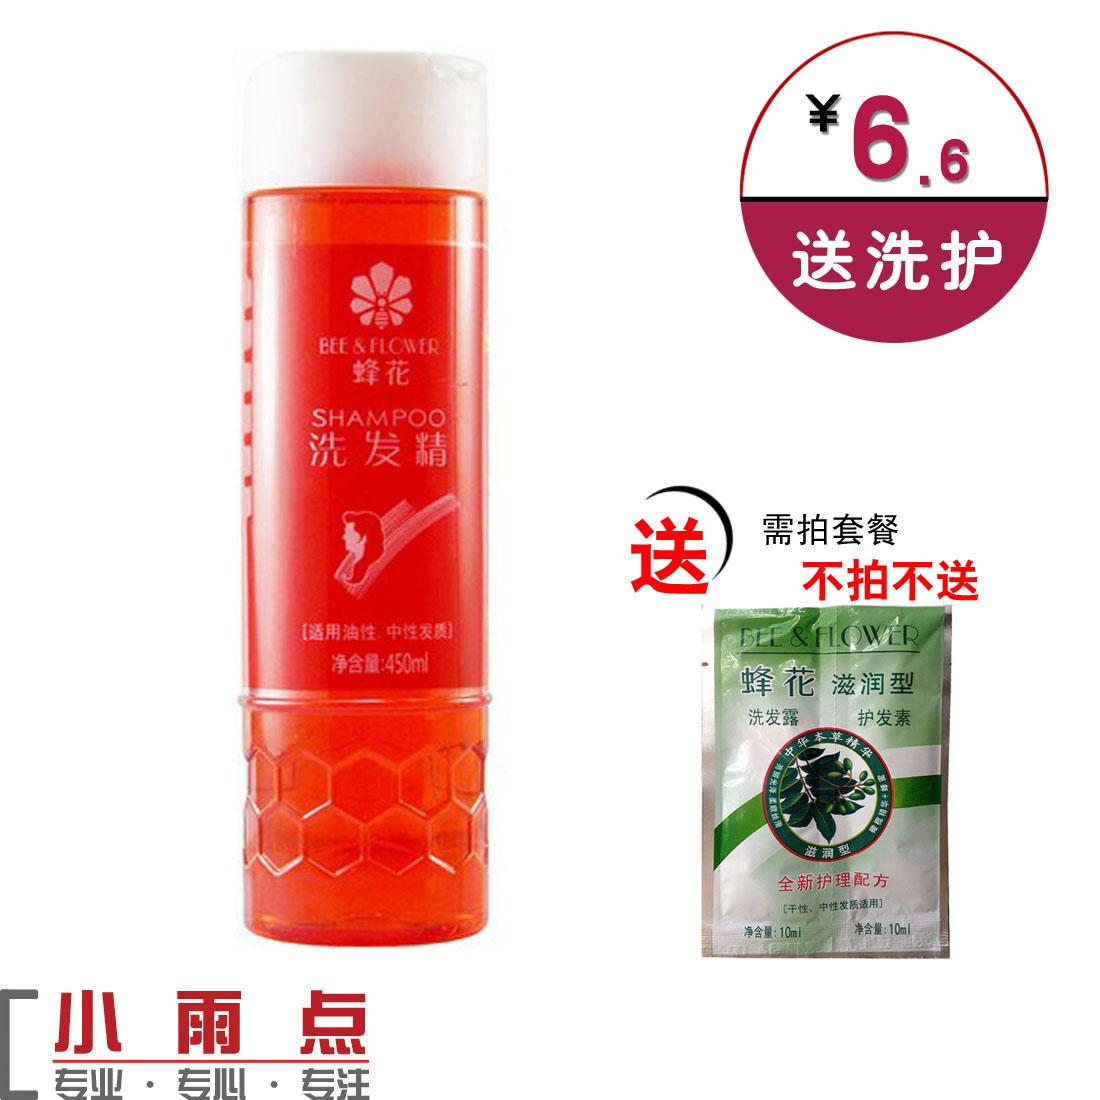 - melissyl shampoo 450ml red bottle fresh ruptured itching anti-dandruff